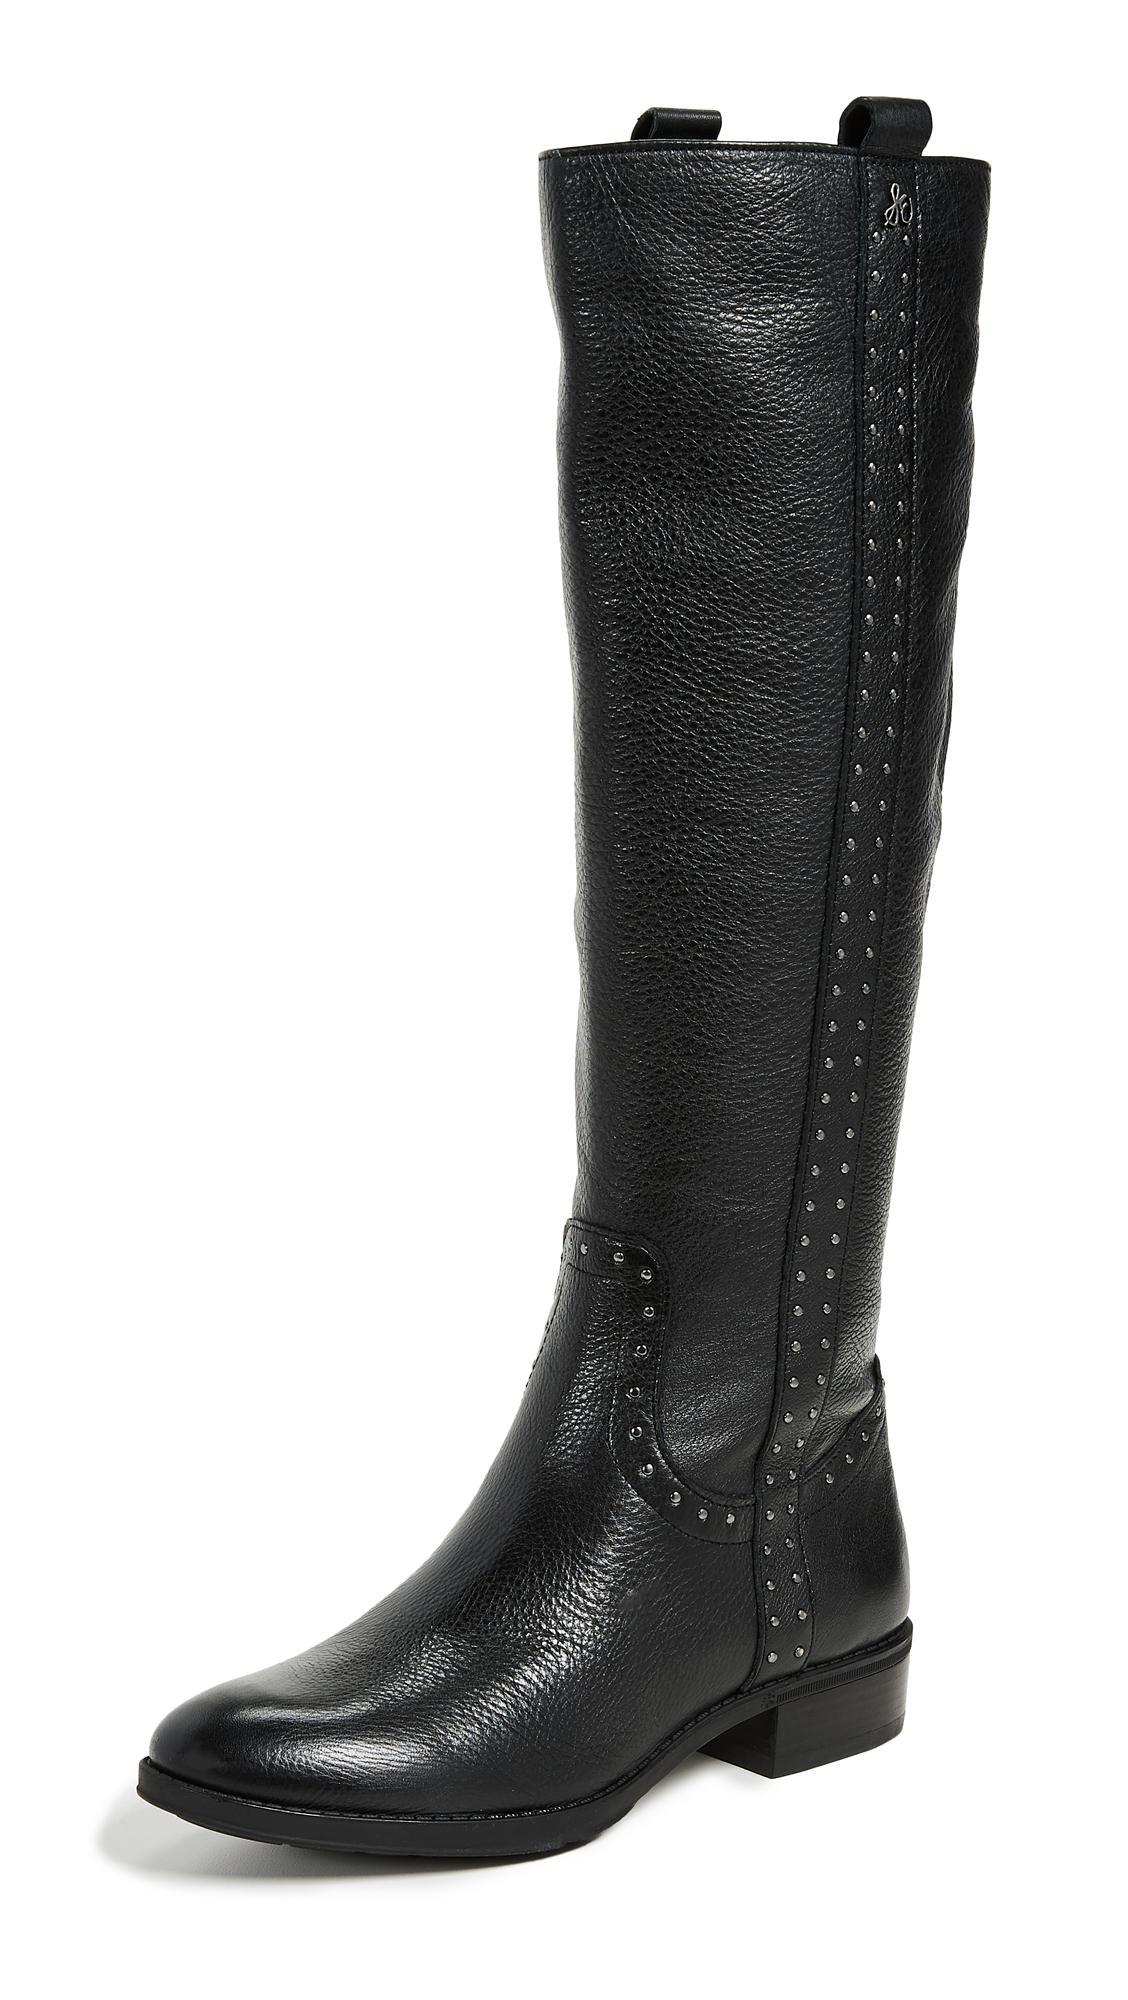 18626b546 SAM EDELMAN Women s Prina 2 Wide Calf Tall Leather Boots in Black. Sam  Edelman Women